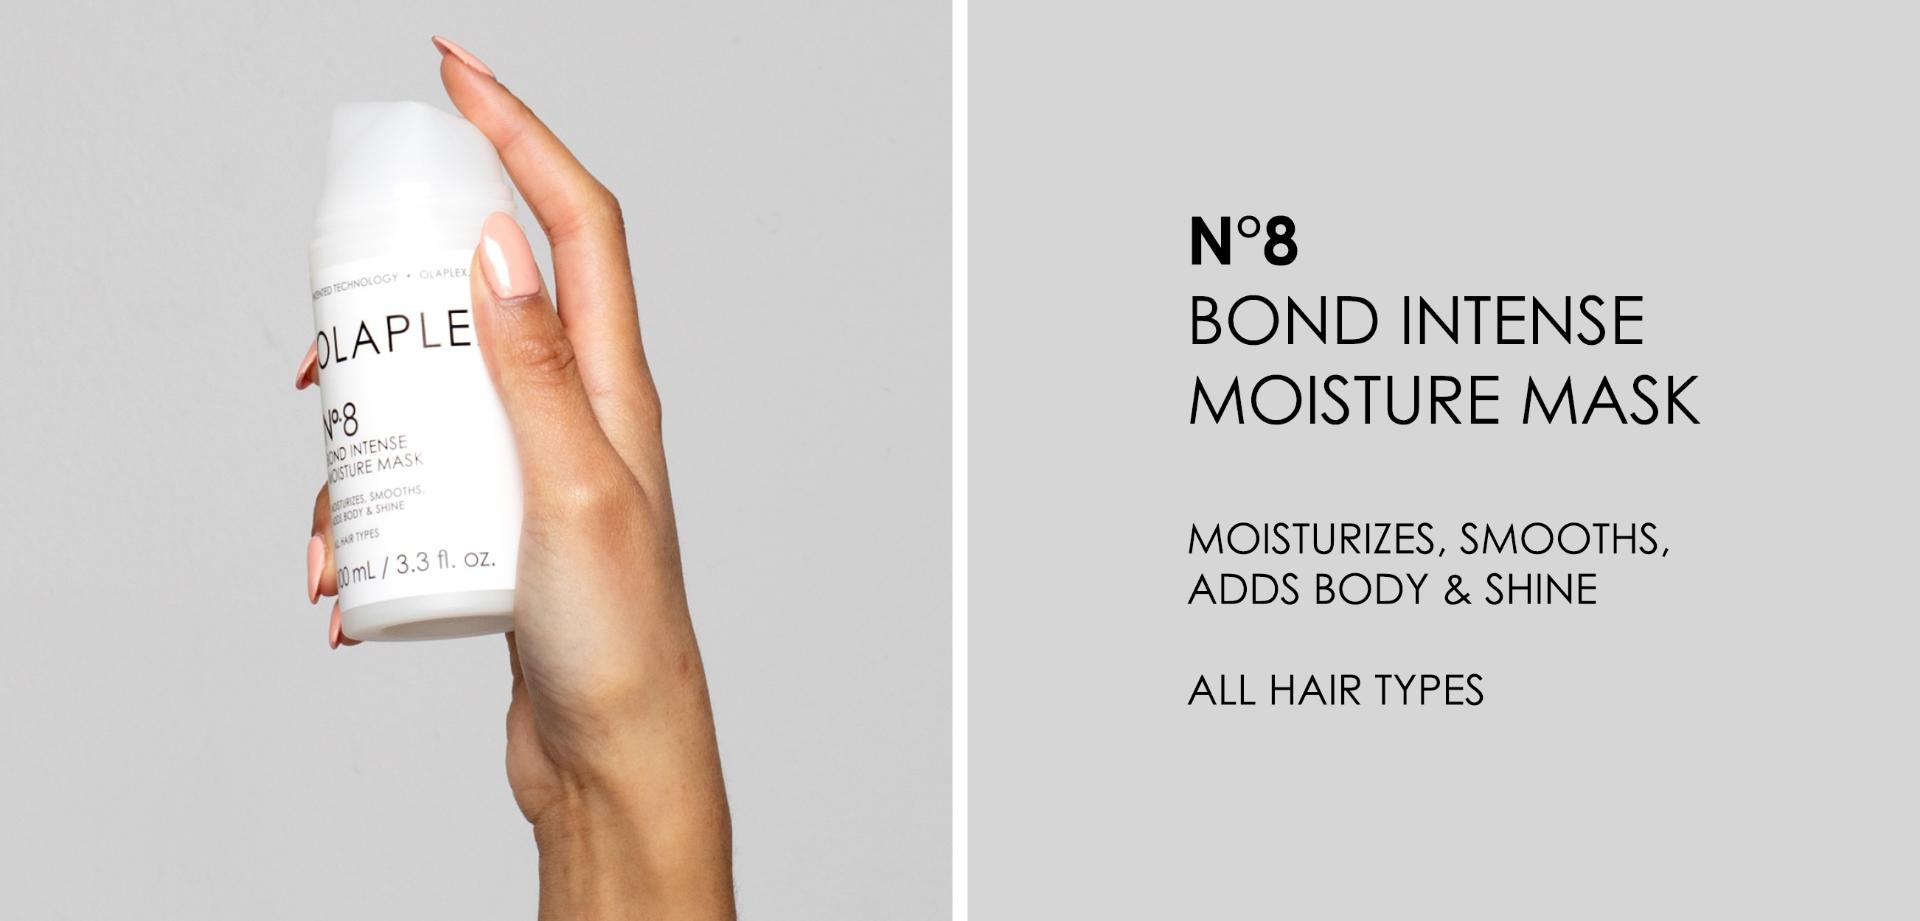 Bond Intense Moisture Mask